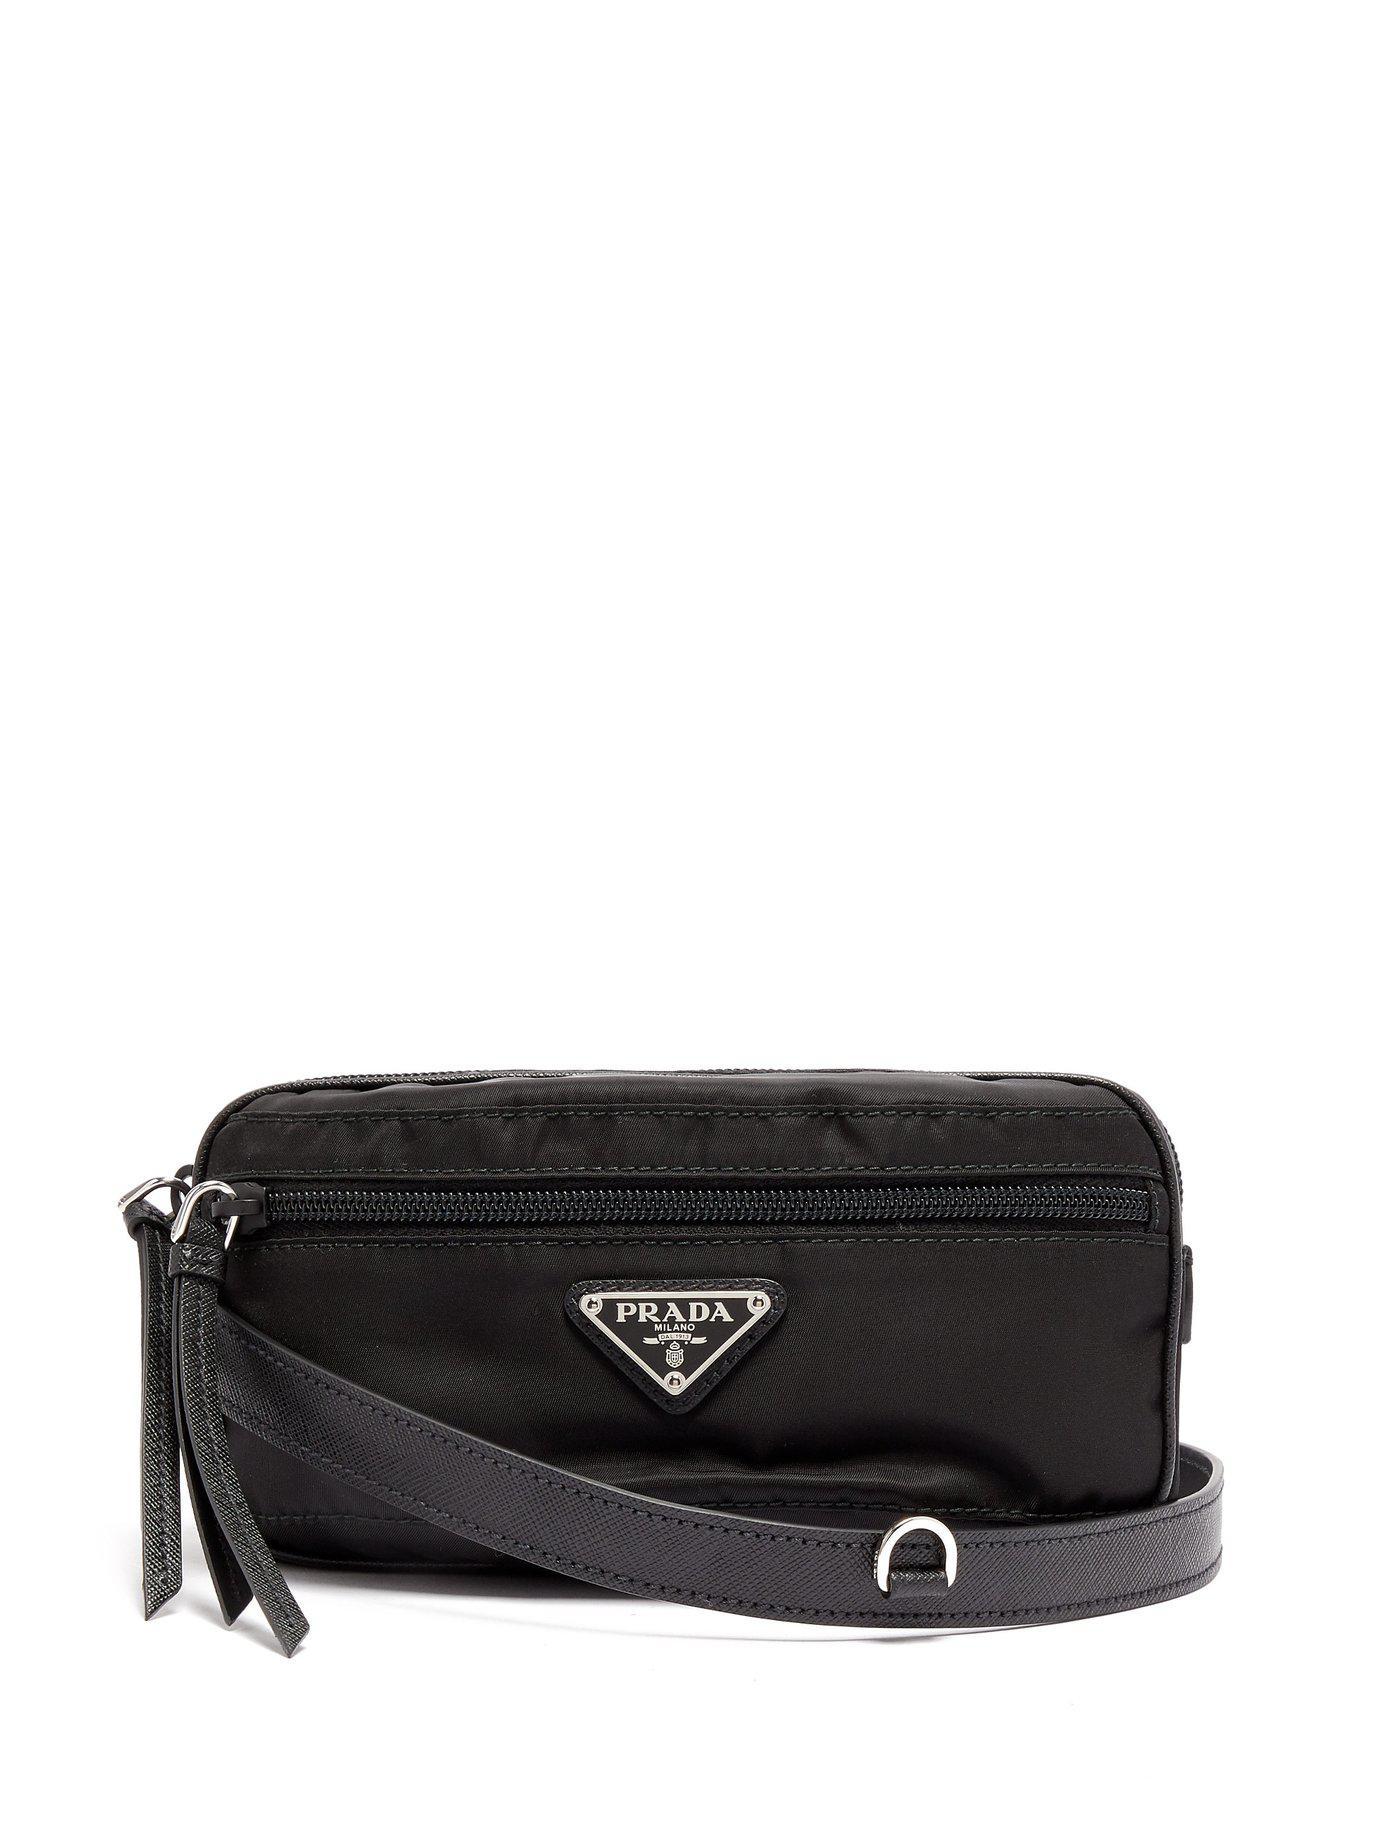 Prada - Black Nylon And Leather Belt Bag - Lyst. View fullscreen 0bd0d30aa2cd9